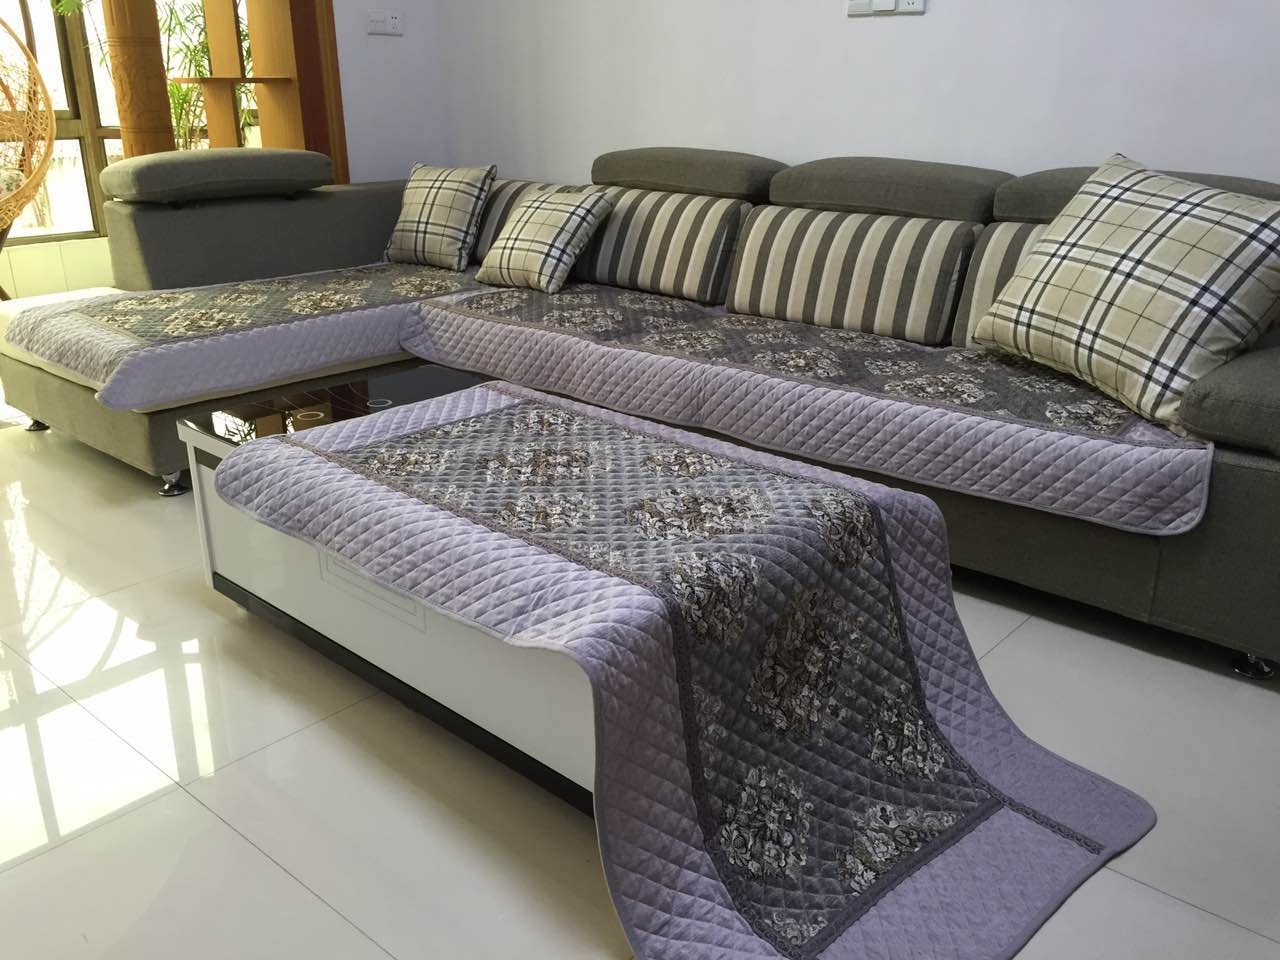 Superbe Cool Custom Sofa Covers , Elegant Custom Sofa Covers 53 In Living Room Sofa  Inspiration With Custom Sofa Covers , Http://sofascouch.com/custom Sofa  Covers/ ...